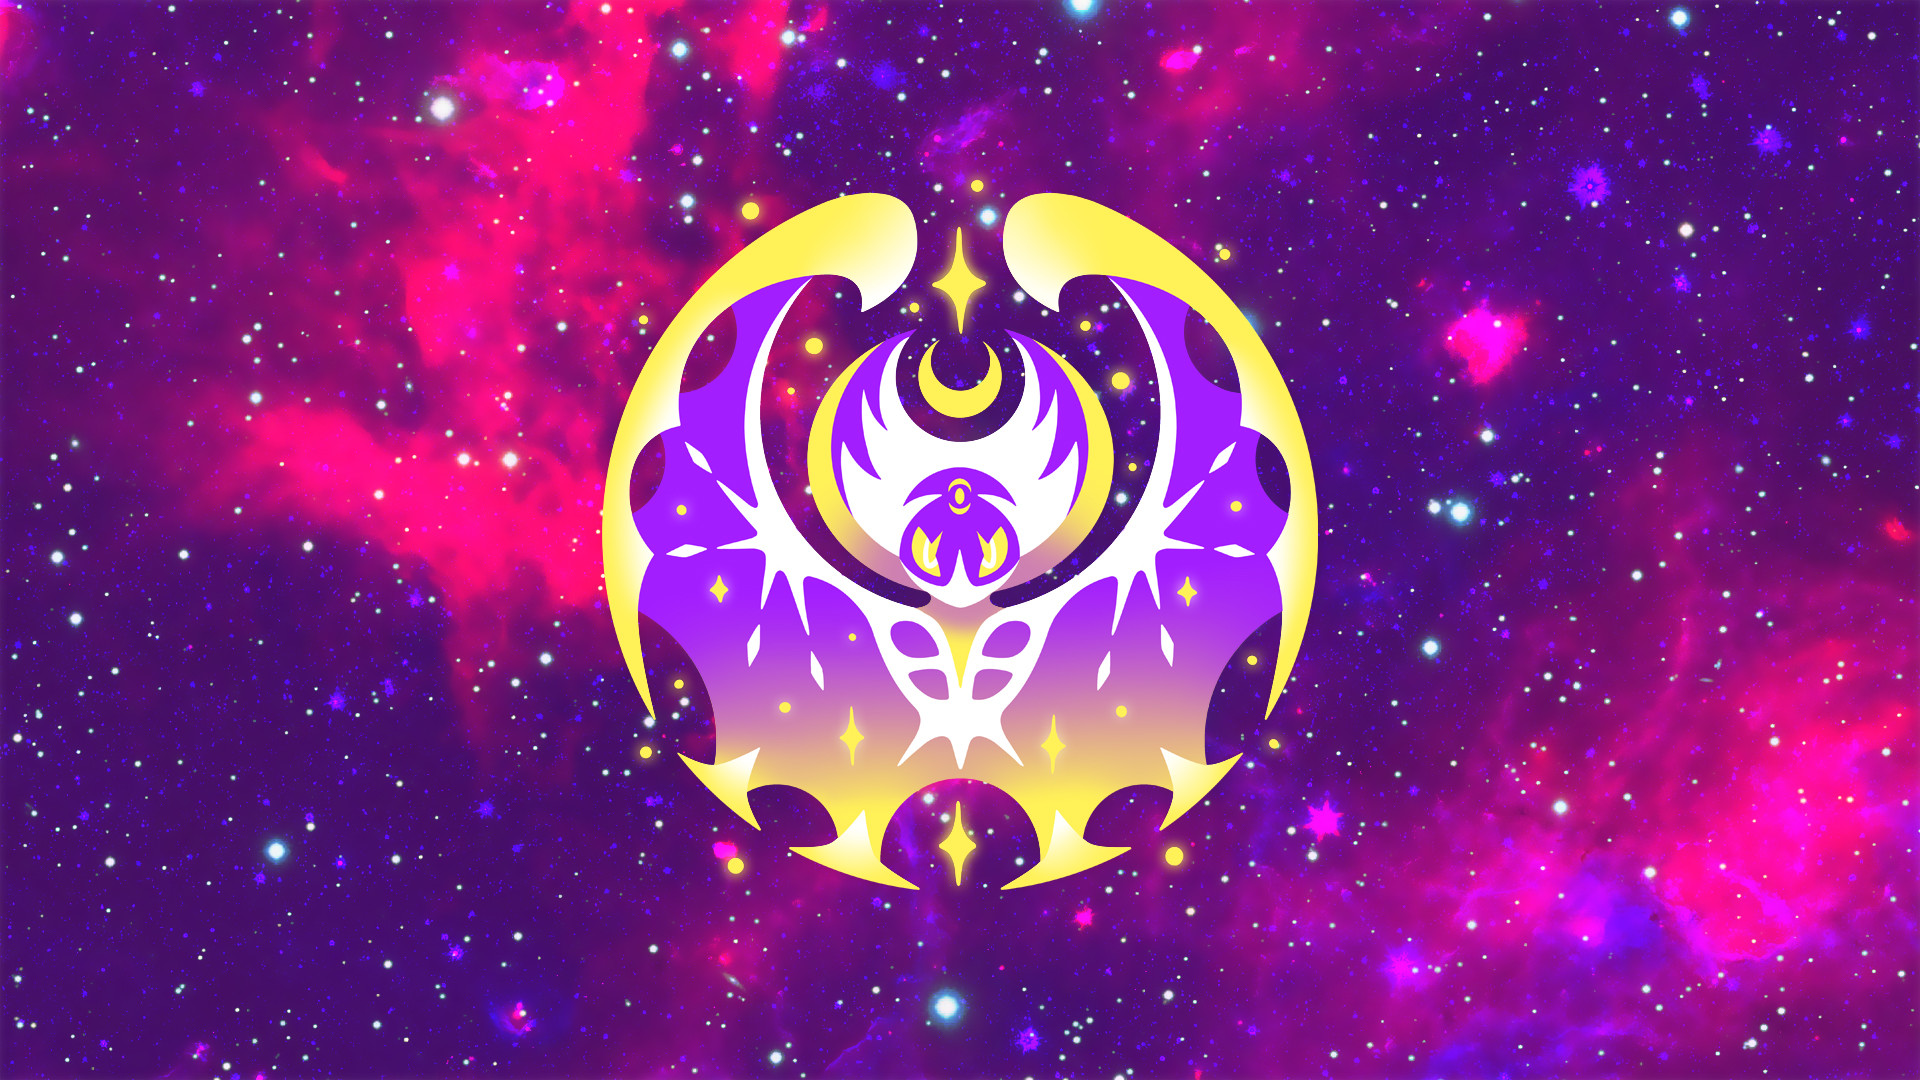 Video Game РPok̩mon Sun and Moon Lunala (Pok̩mon) Wallpaper